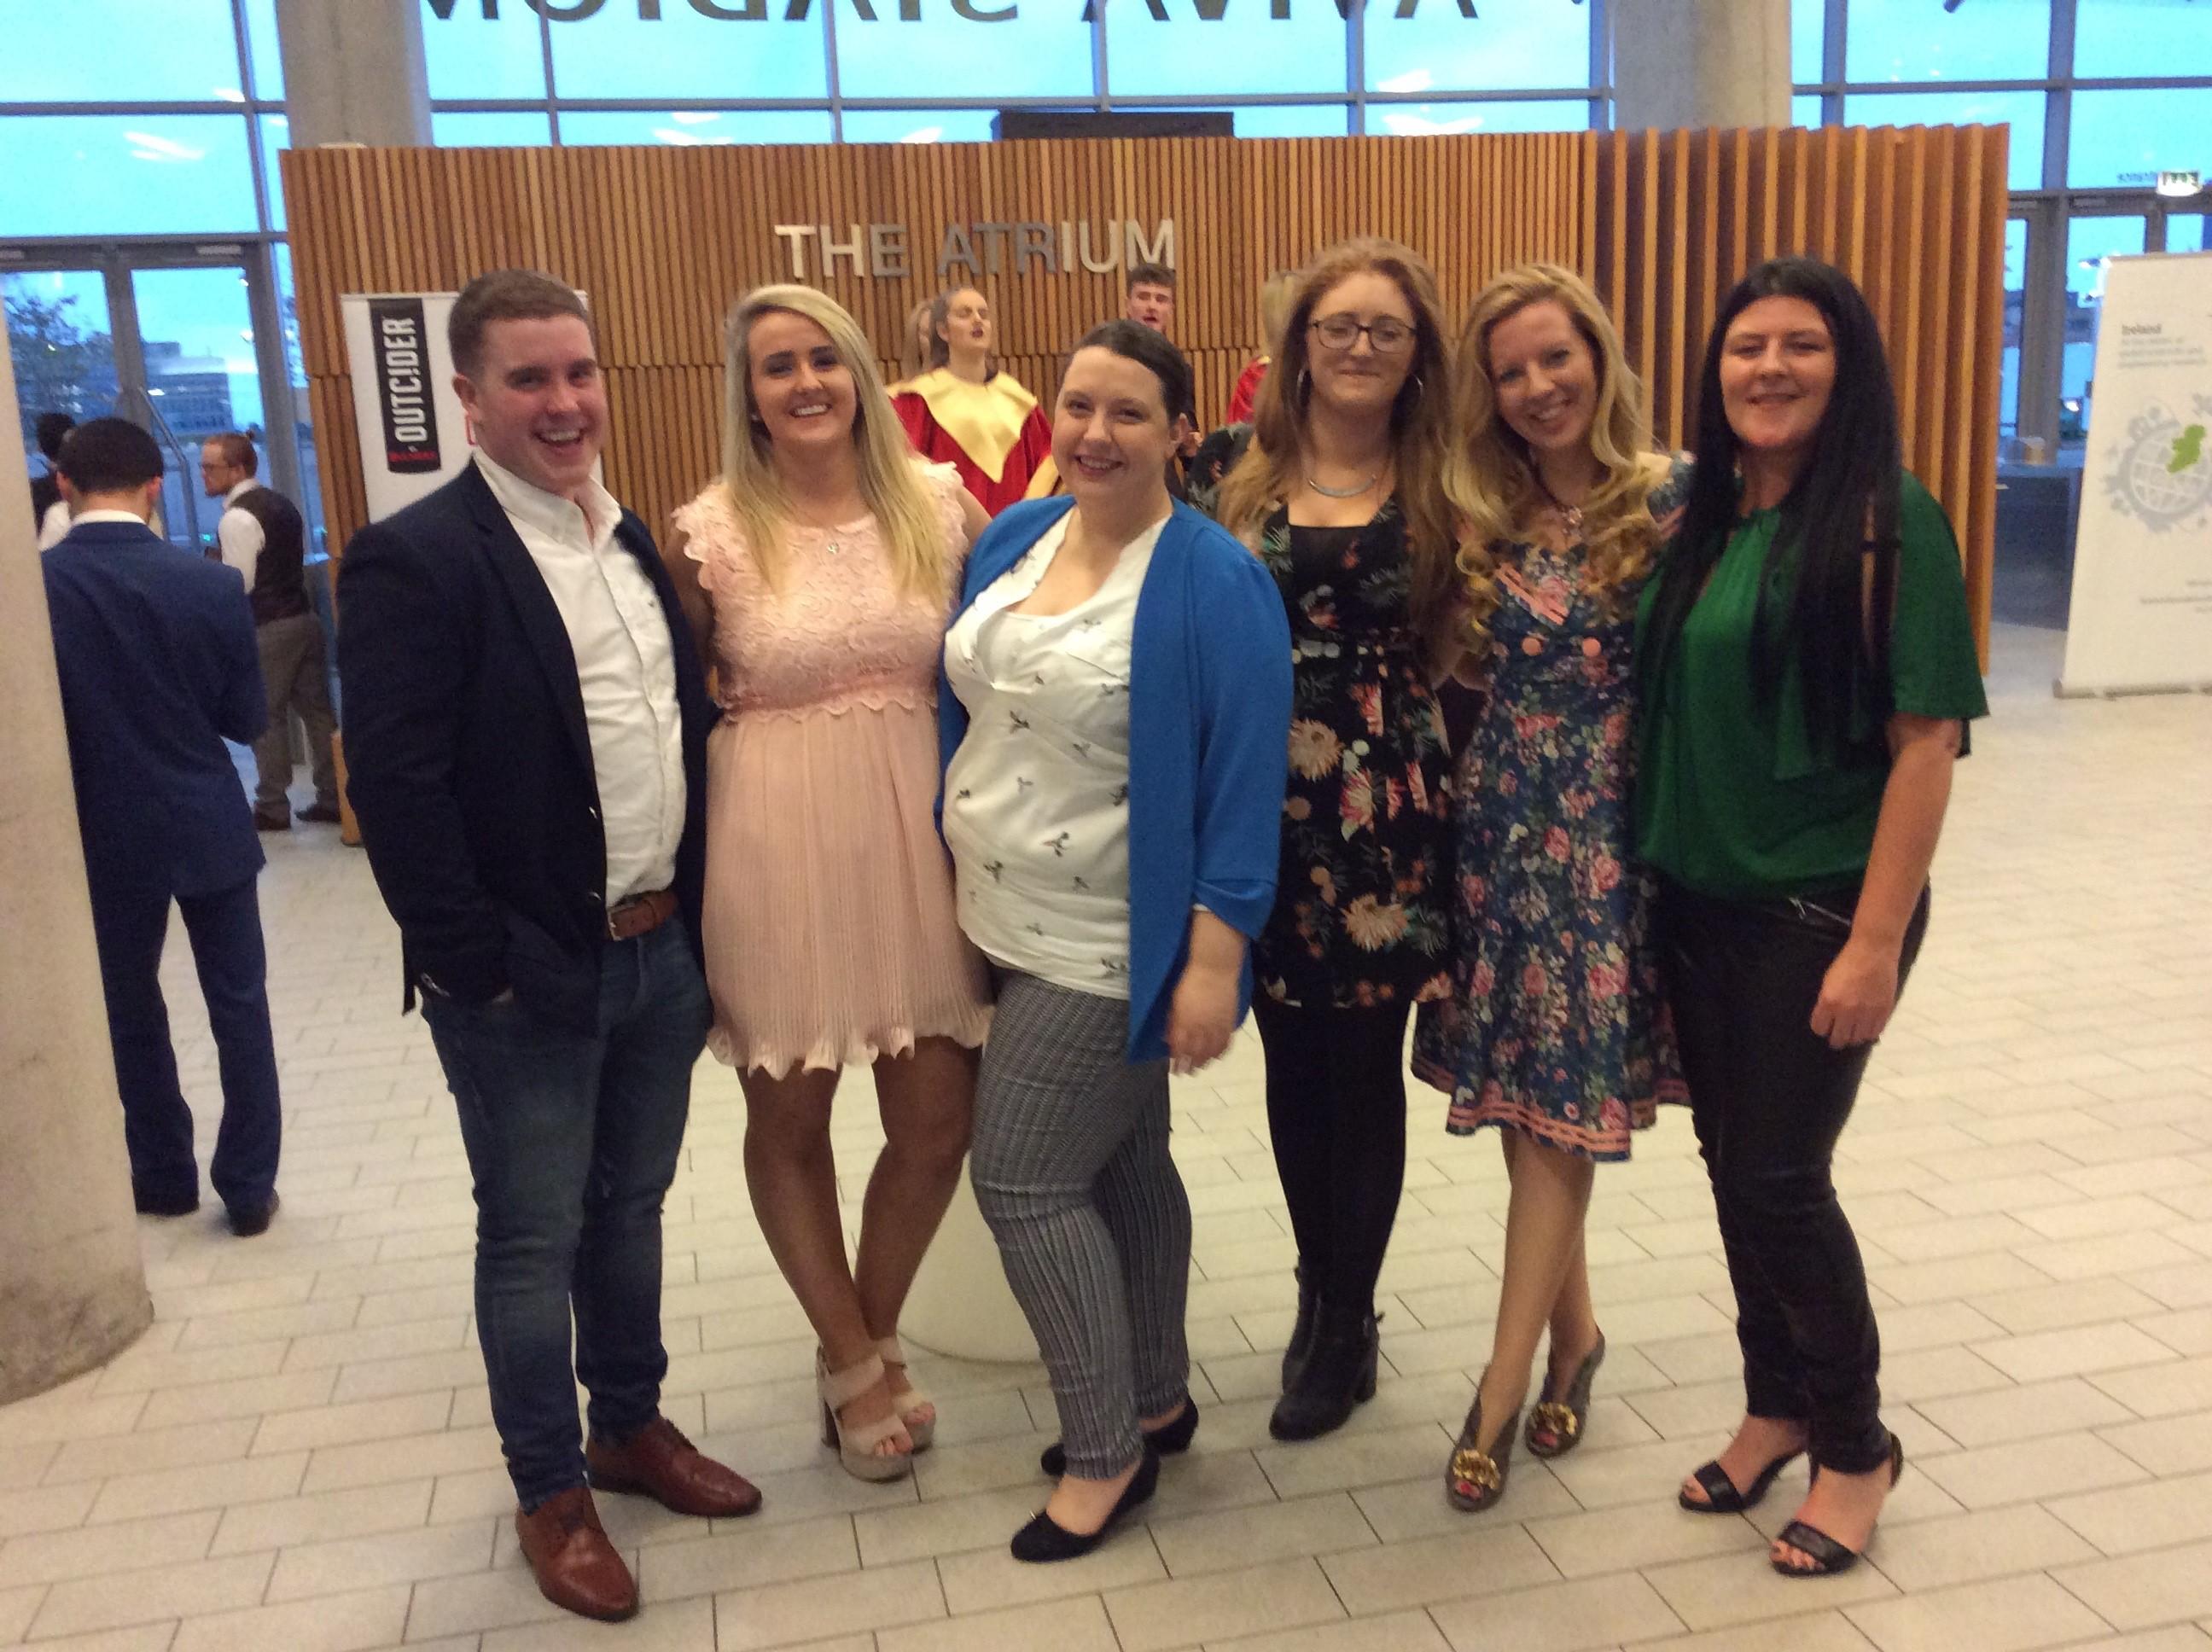 Pictured are, Cian O Hallaran, Dungarvan; Sarah McCoy, Cork; Nemeton Editor Yvonne Weaver;  Winner Ailbhe Nic Dhonncha, An Rinn; Deirdre Orme and Ciara Malone